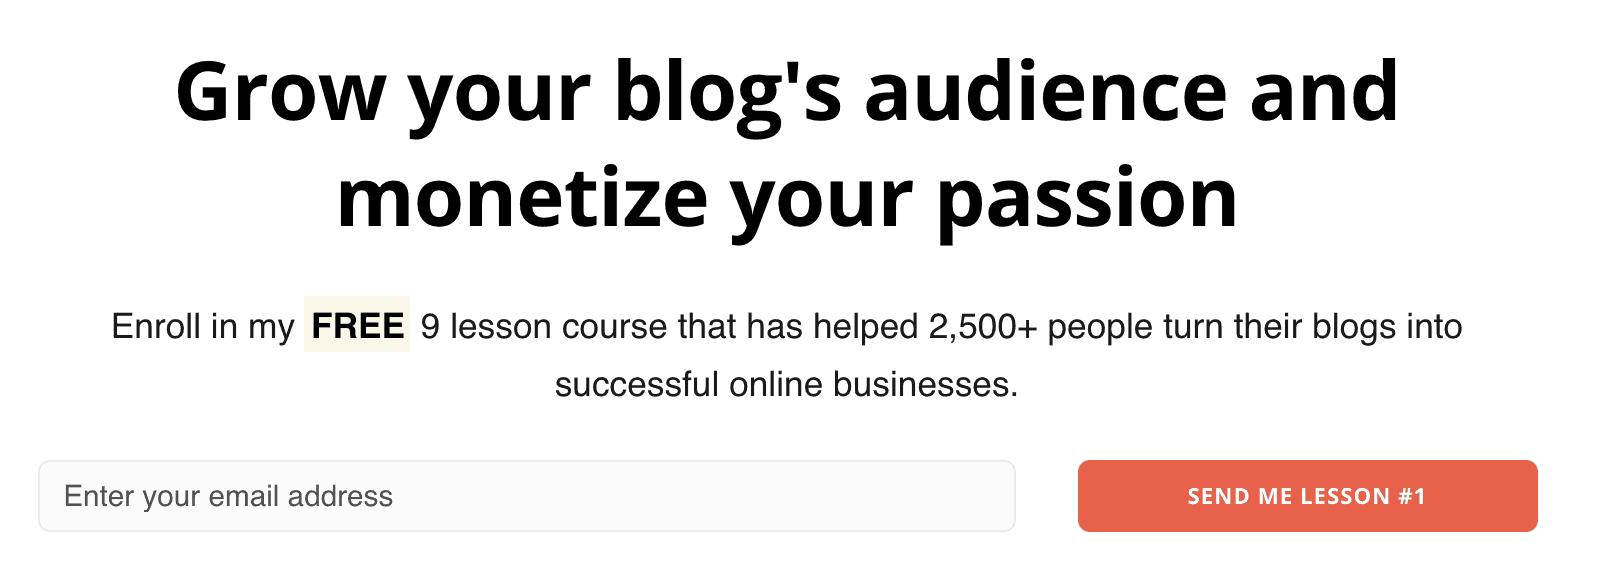 Screenshot of blogprofits.co free course enrollment landing page